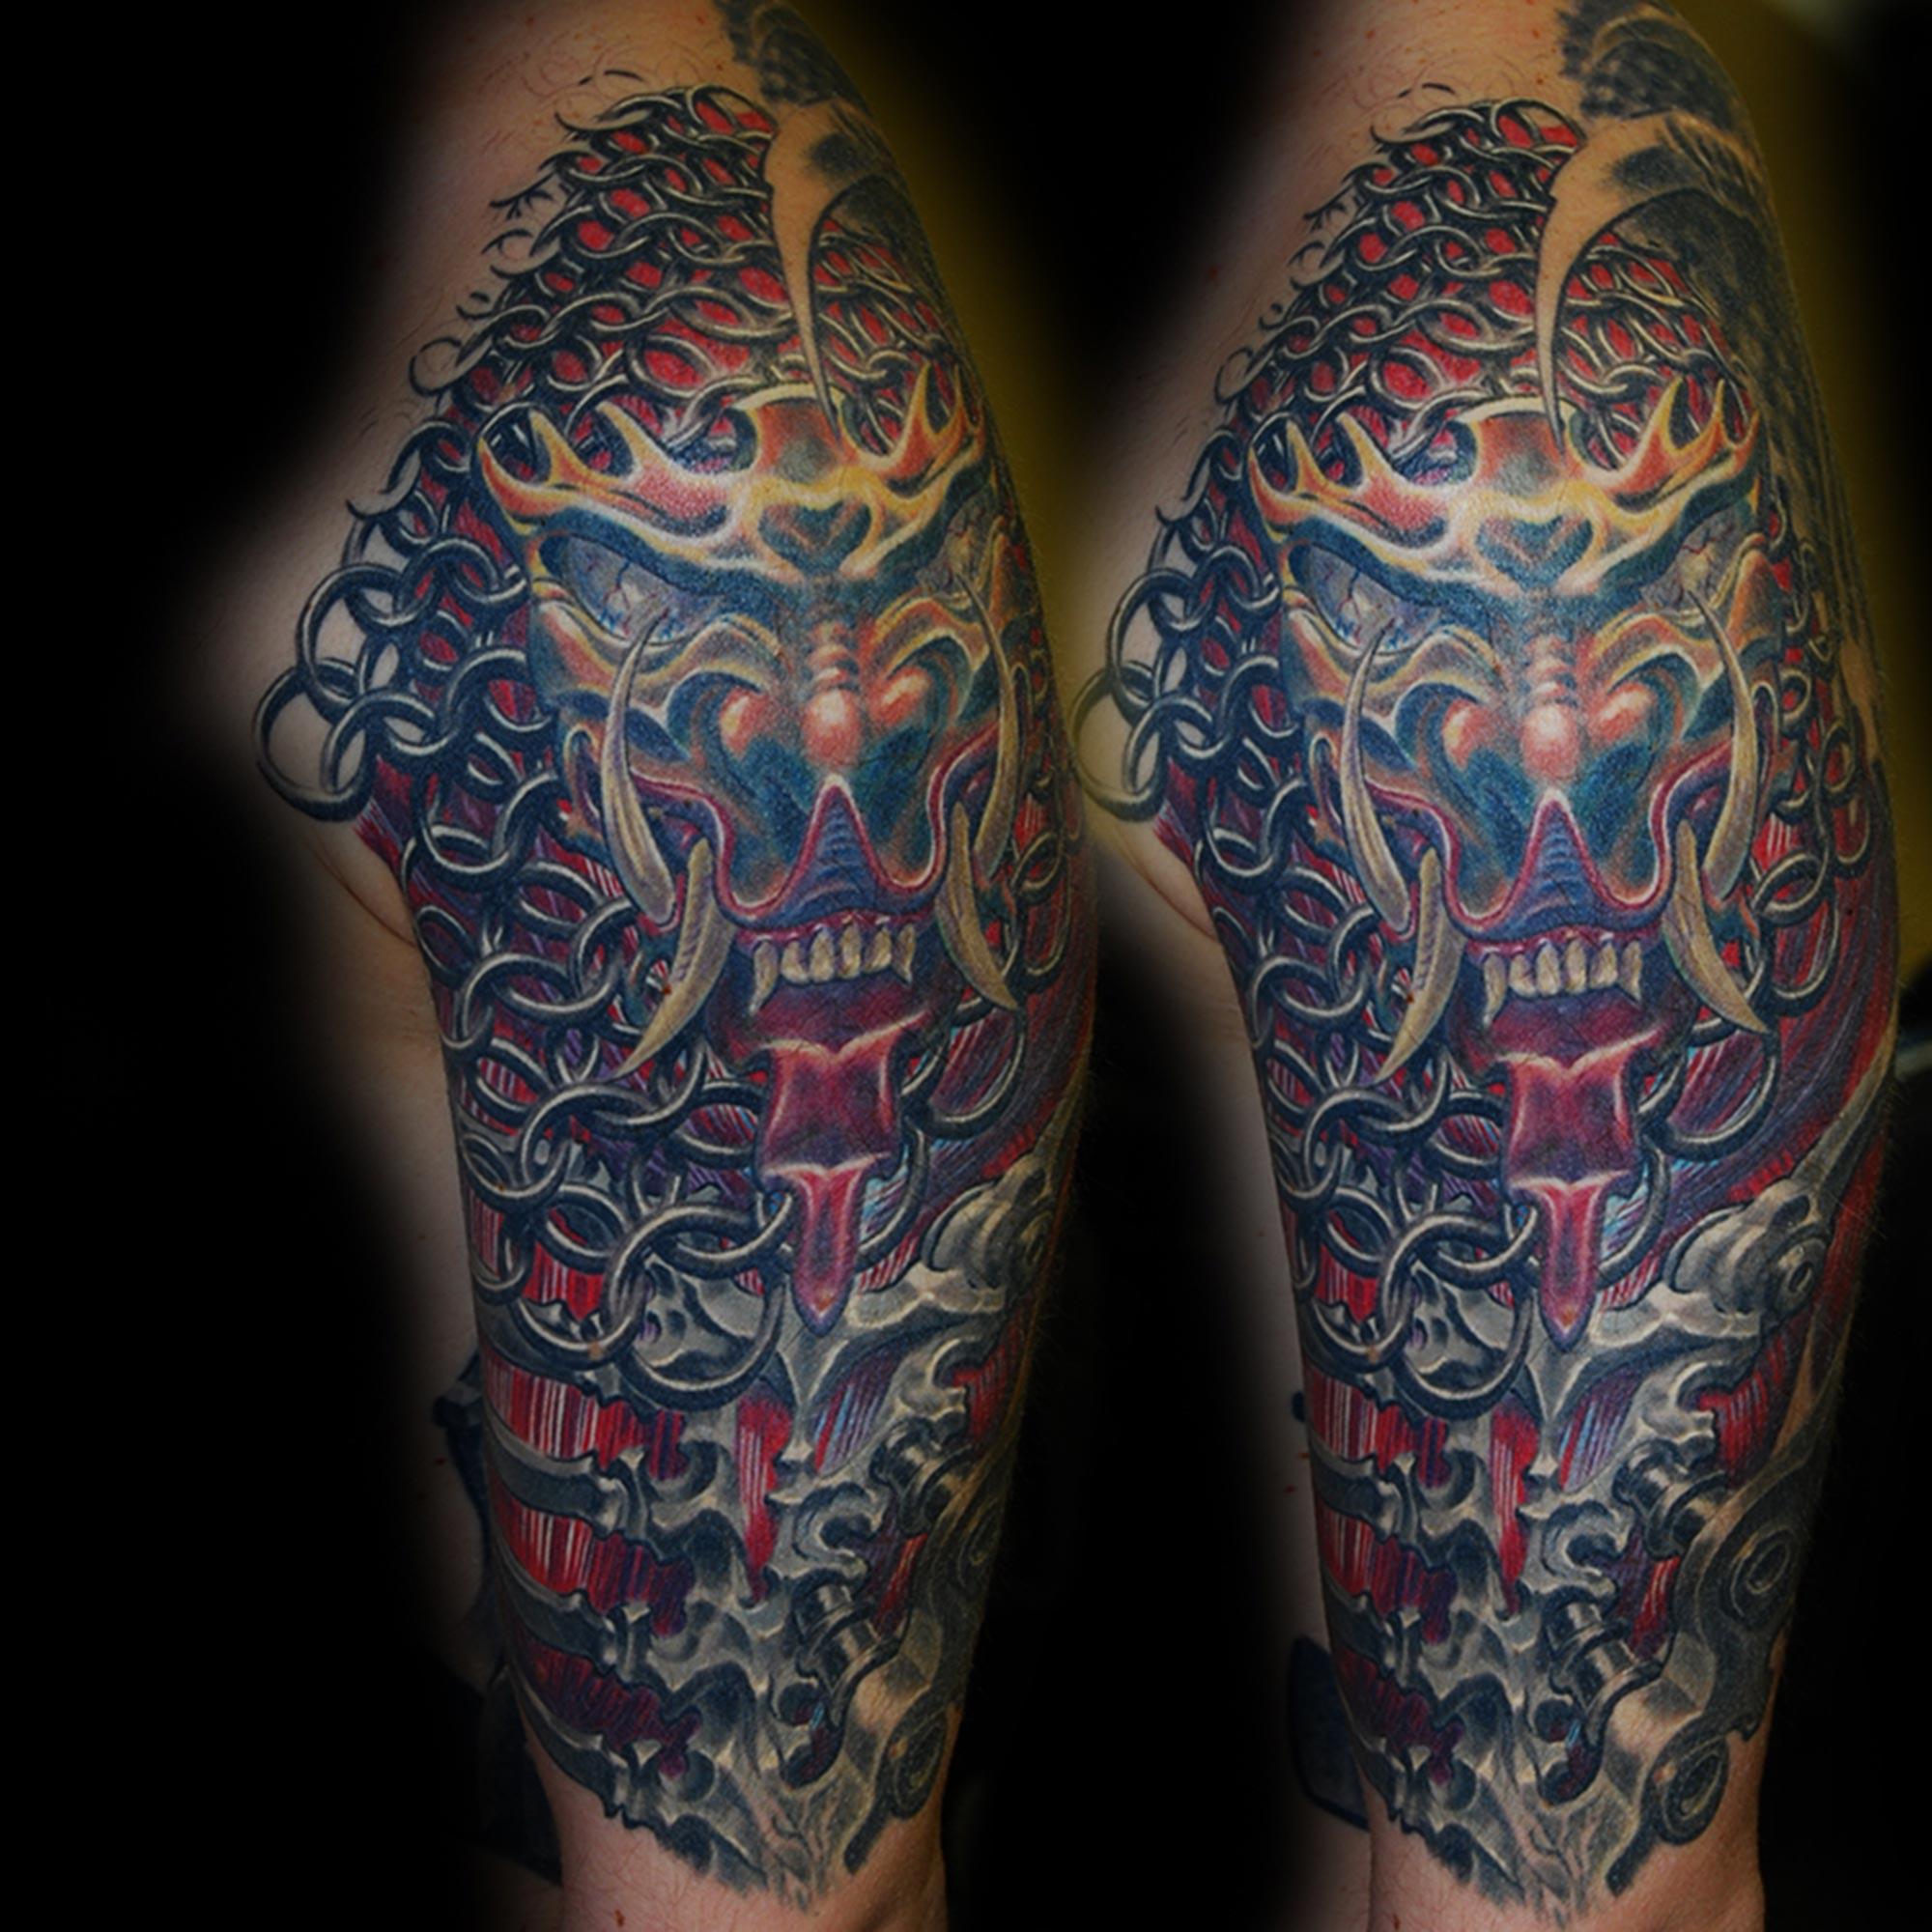 Biomechanik Tattoo Maske Of Tho Richtig Terrible Pain Und Duhm